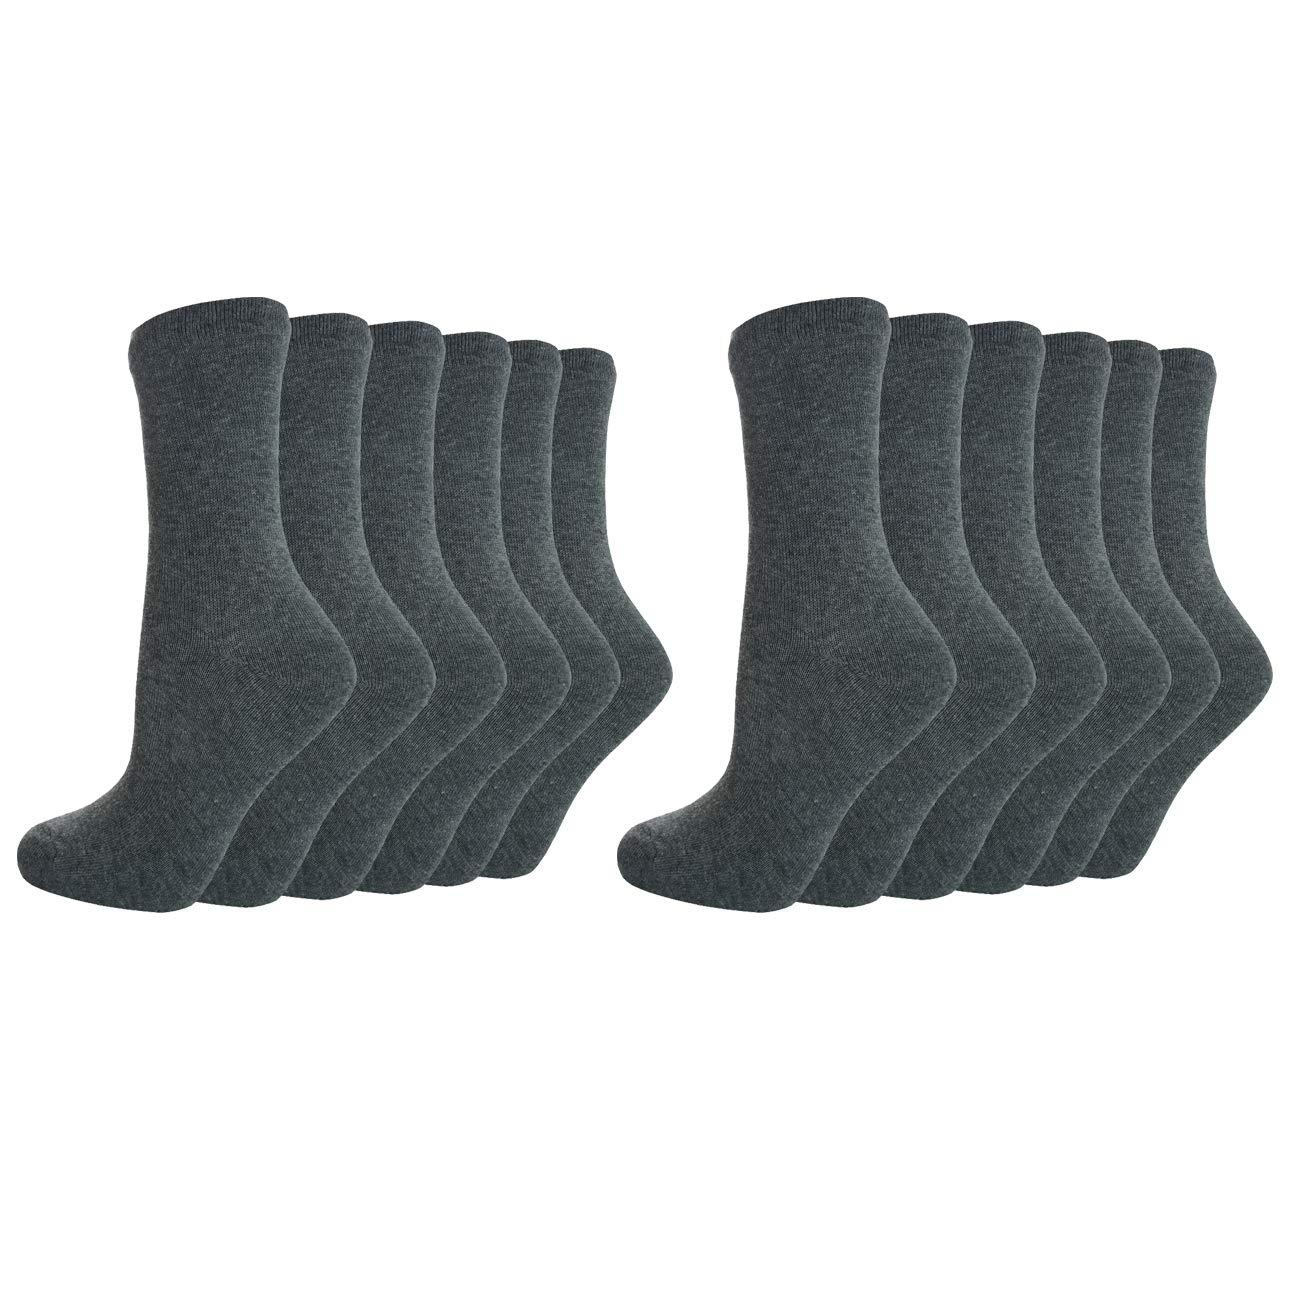 Metzuyan Kids Unisex Girls Boys Back To School Socks Plain